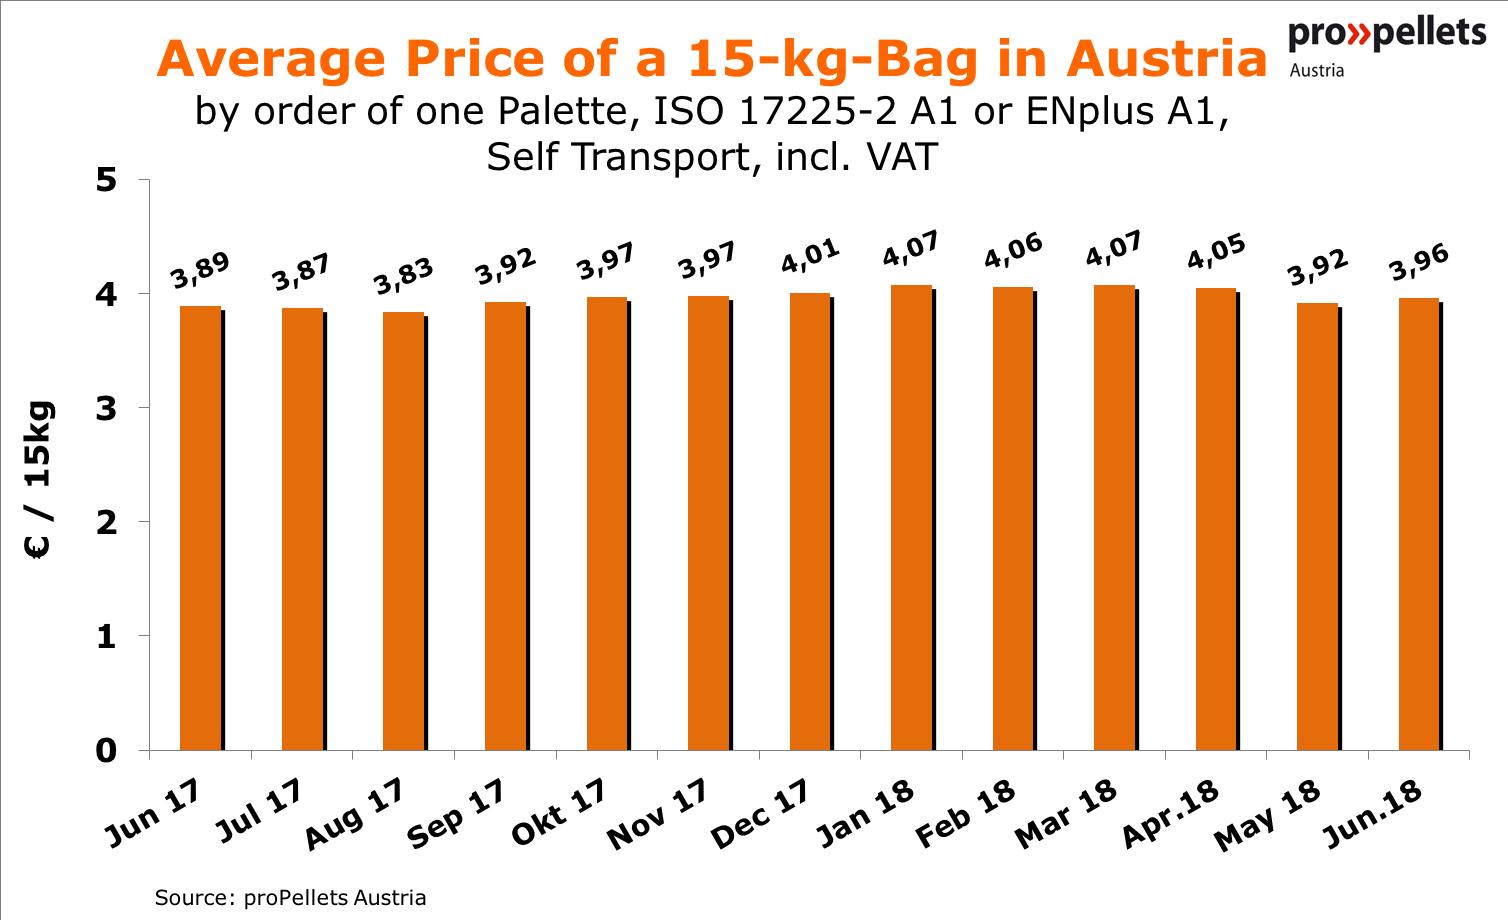 Average Price of a 15-kg-Bag in Austria